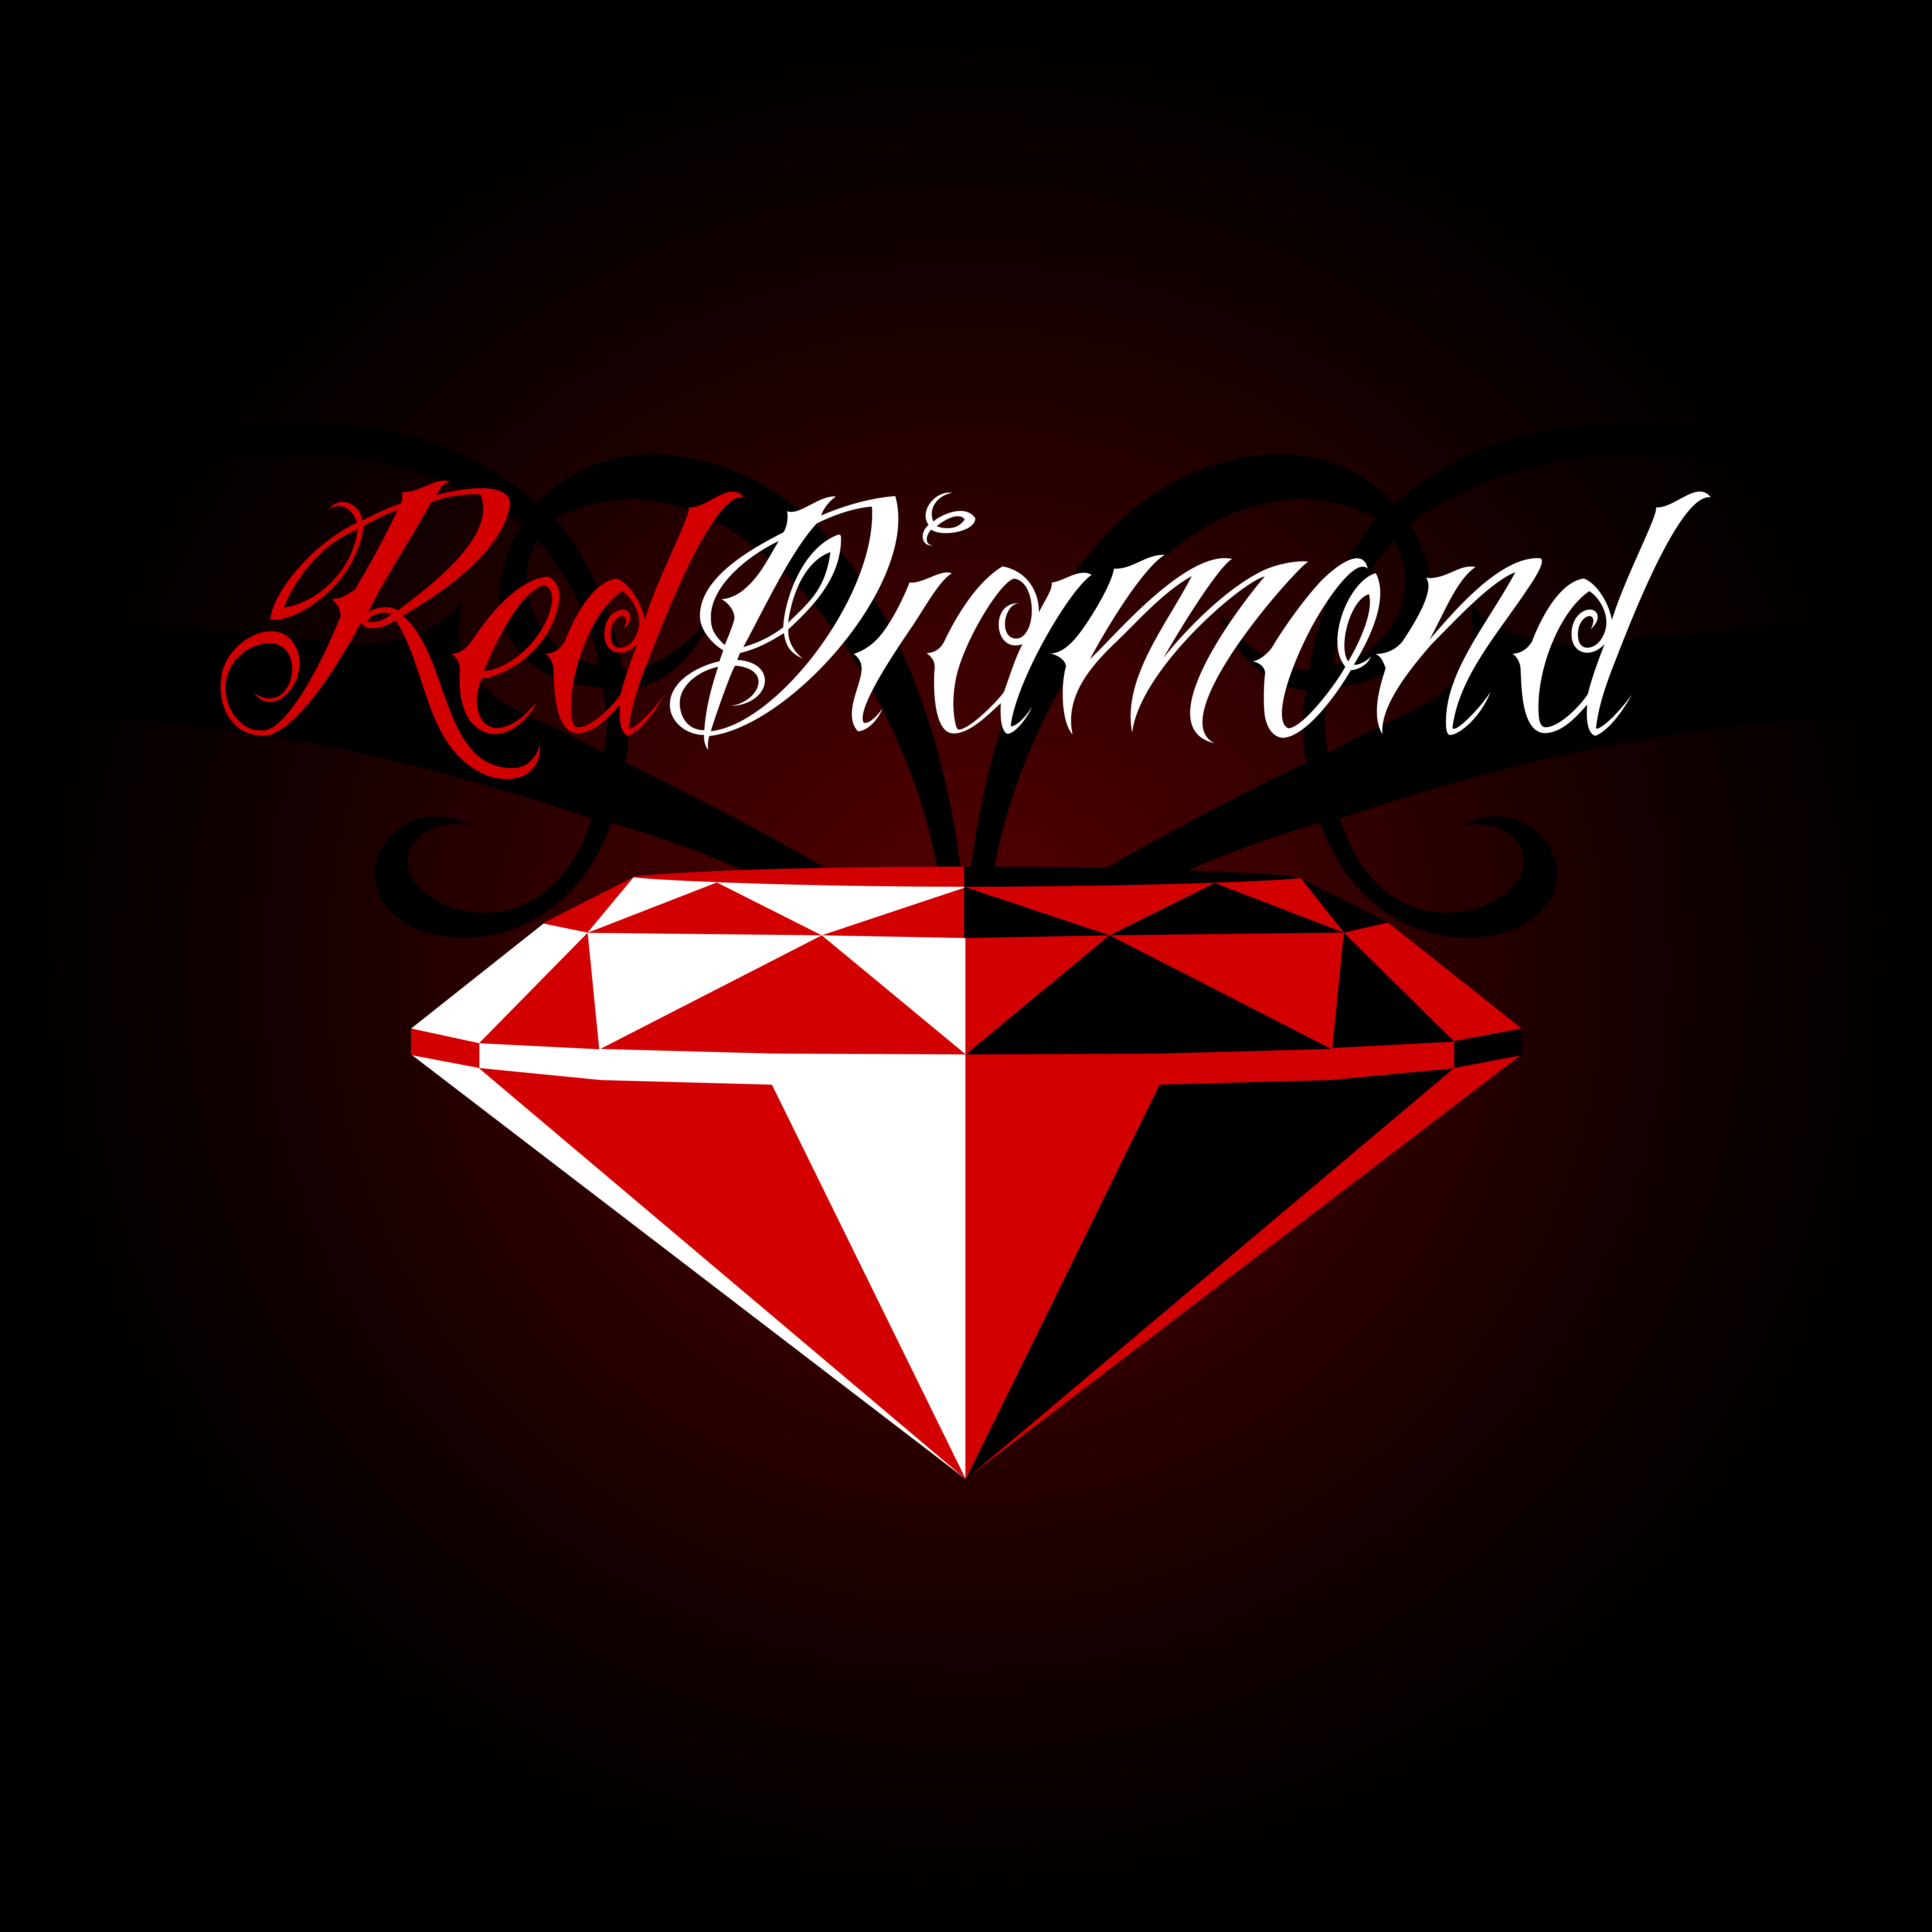 diamond logo wallpaper - photo #17